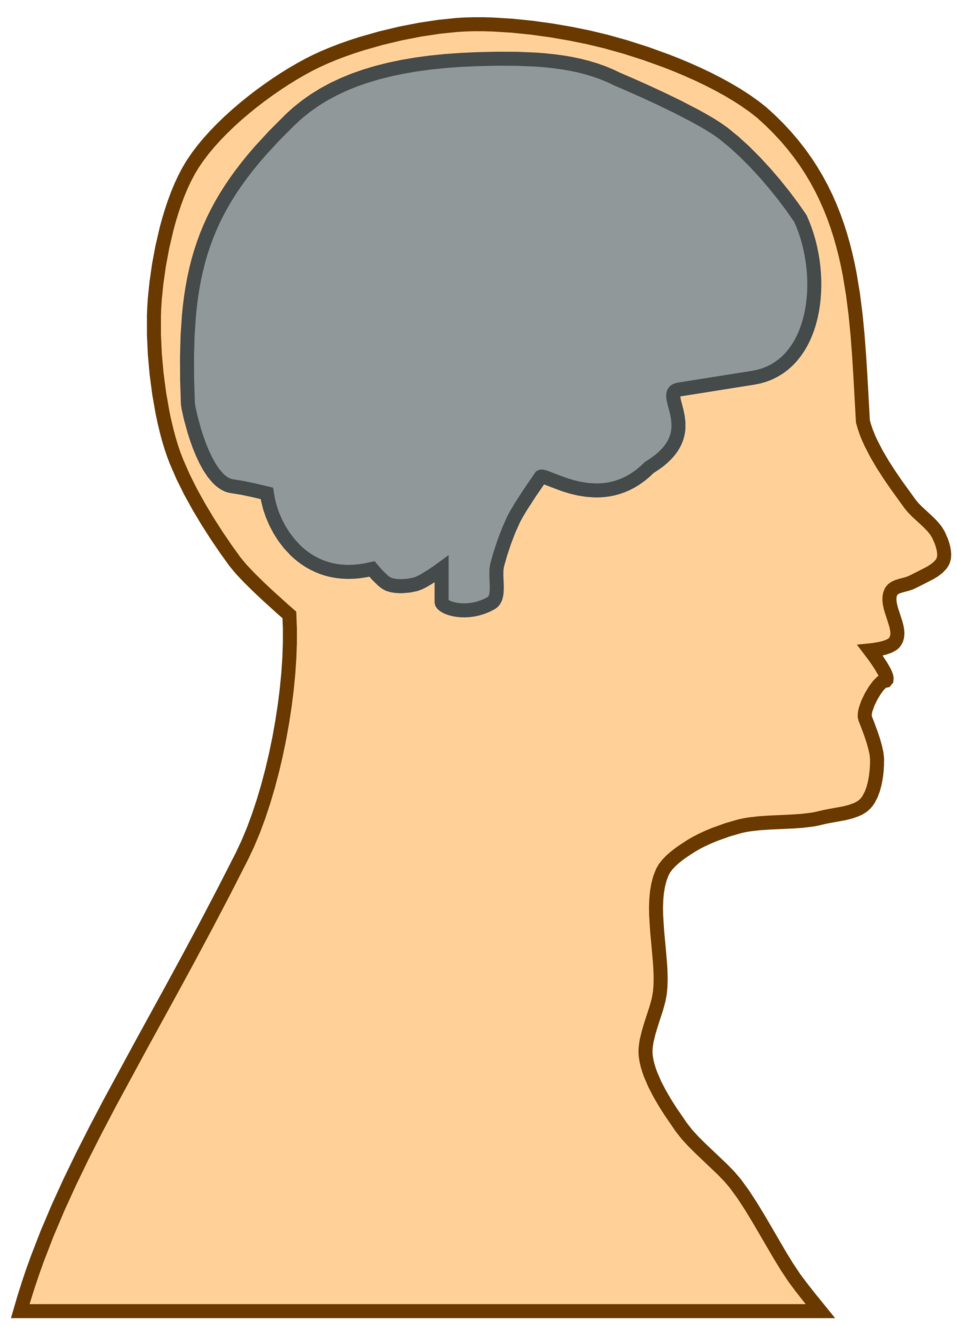 Public domain clip art. Neck clipart chin